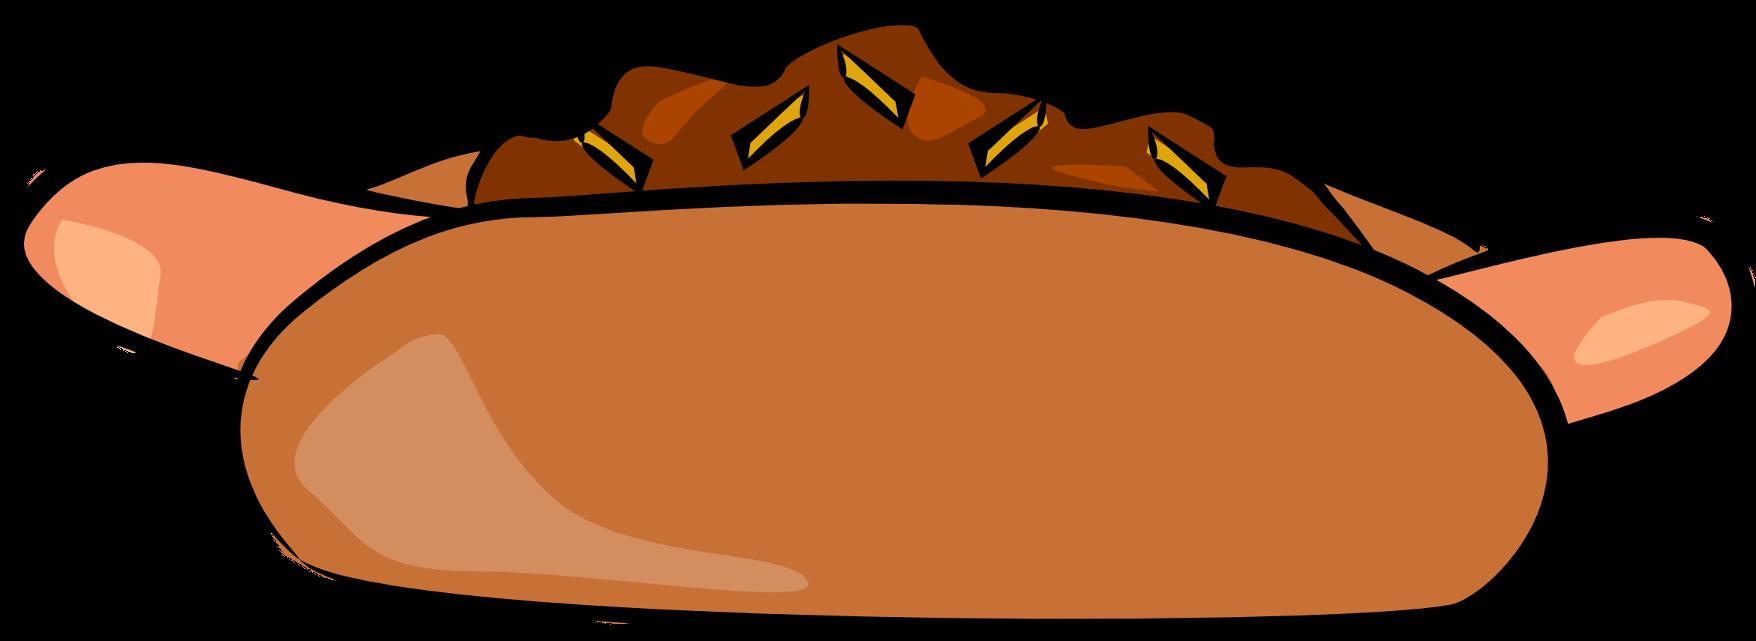 clipart dog bowl - photo #36